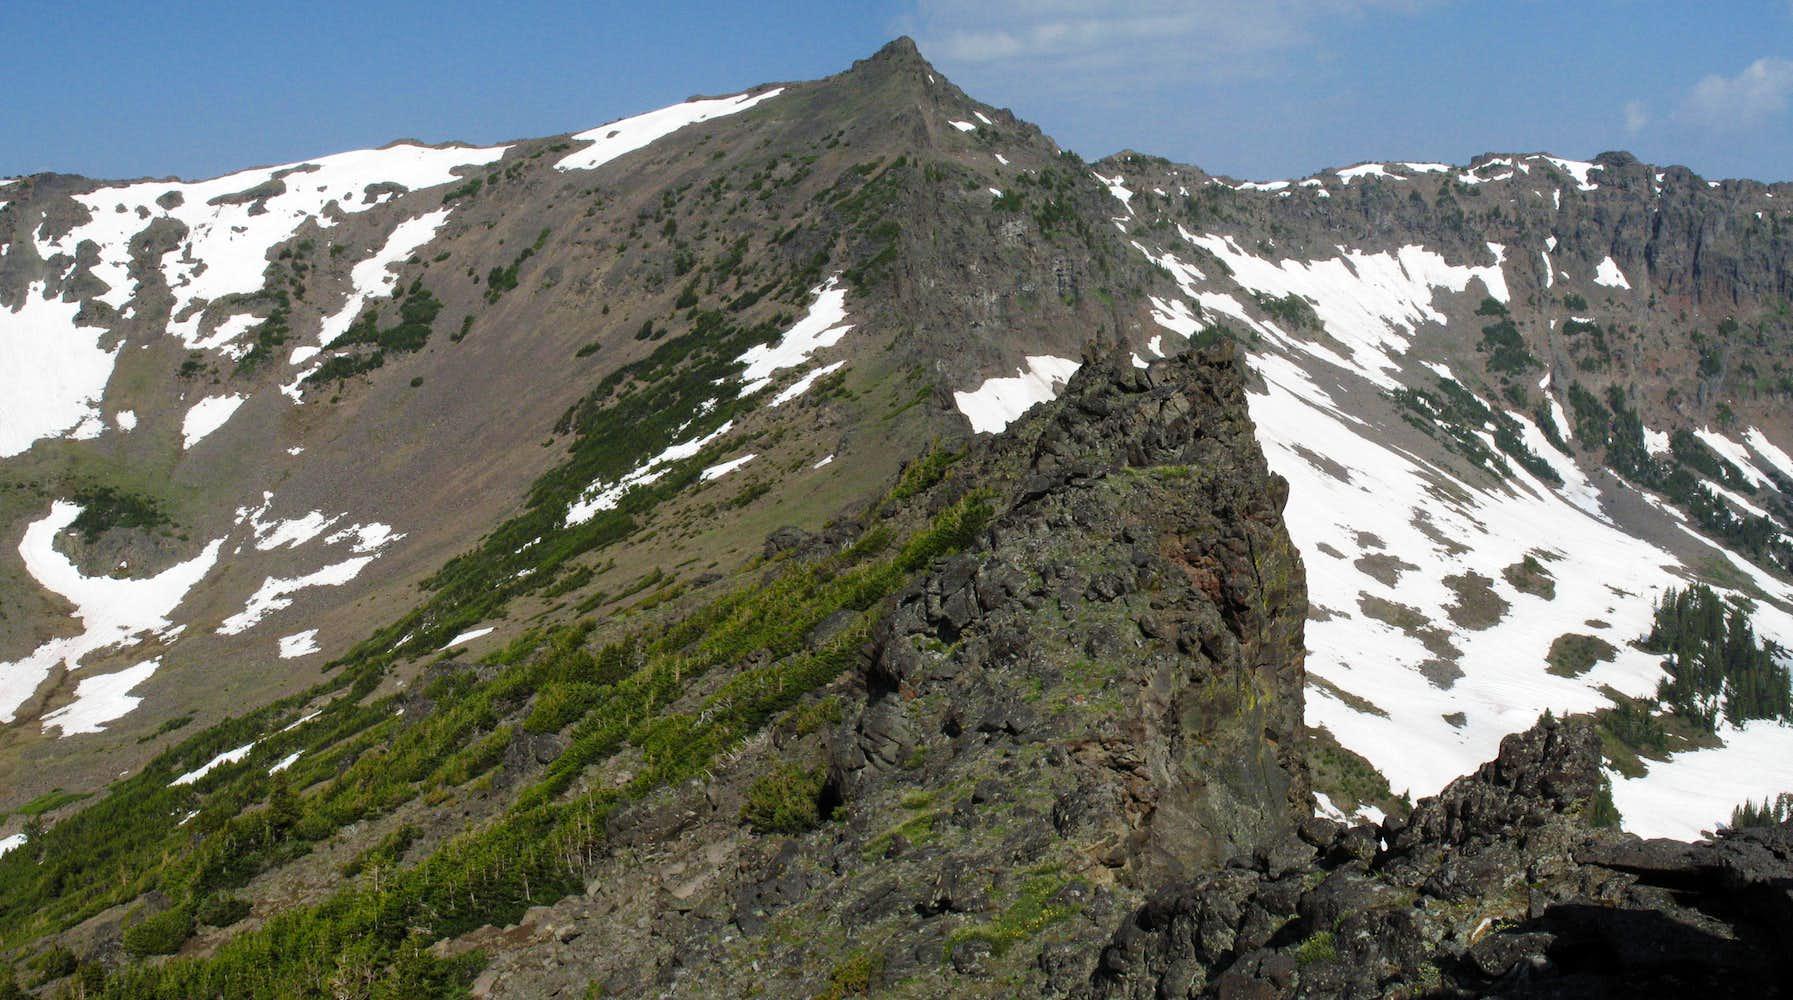 Overlook Mountain : Photos, Diagrams & Topos : SummitPost